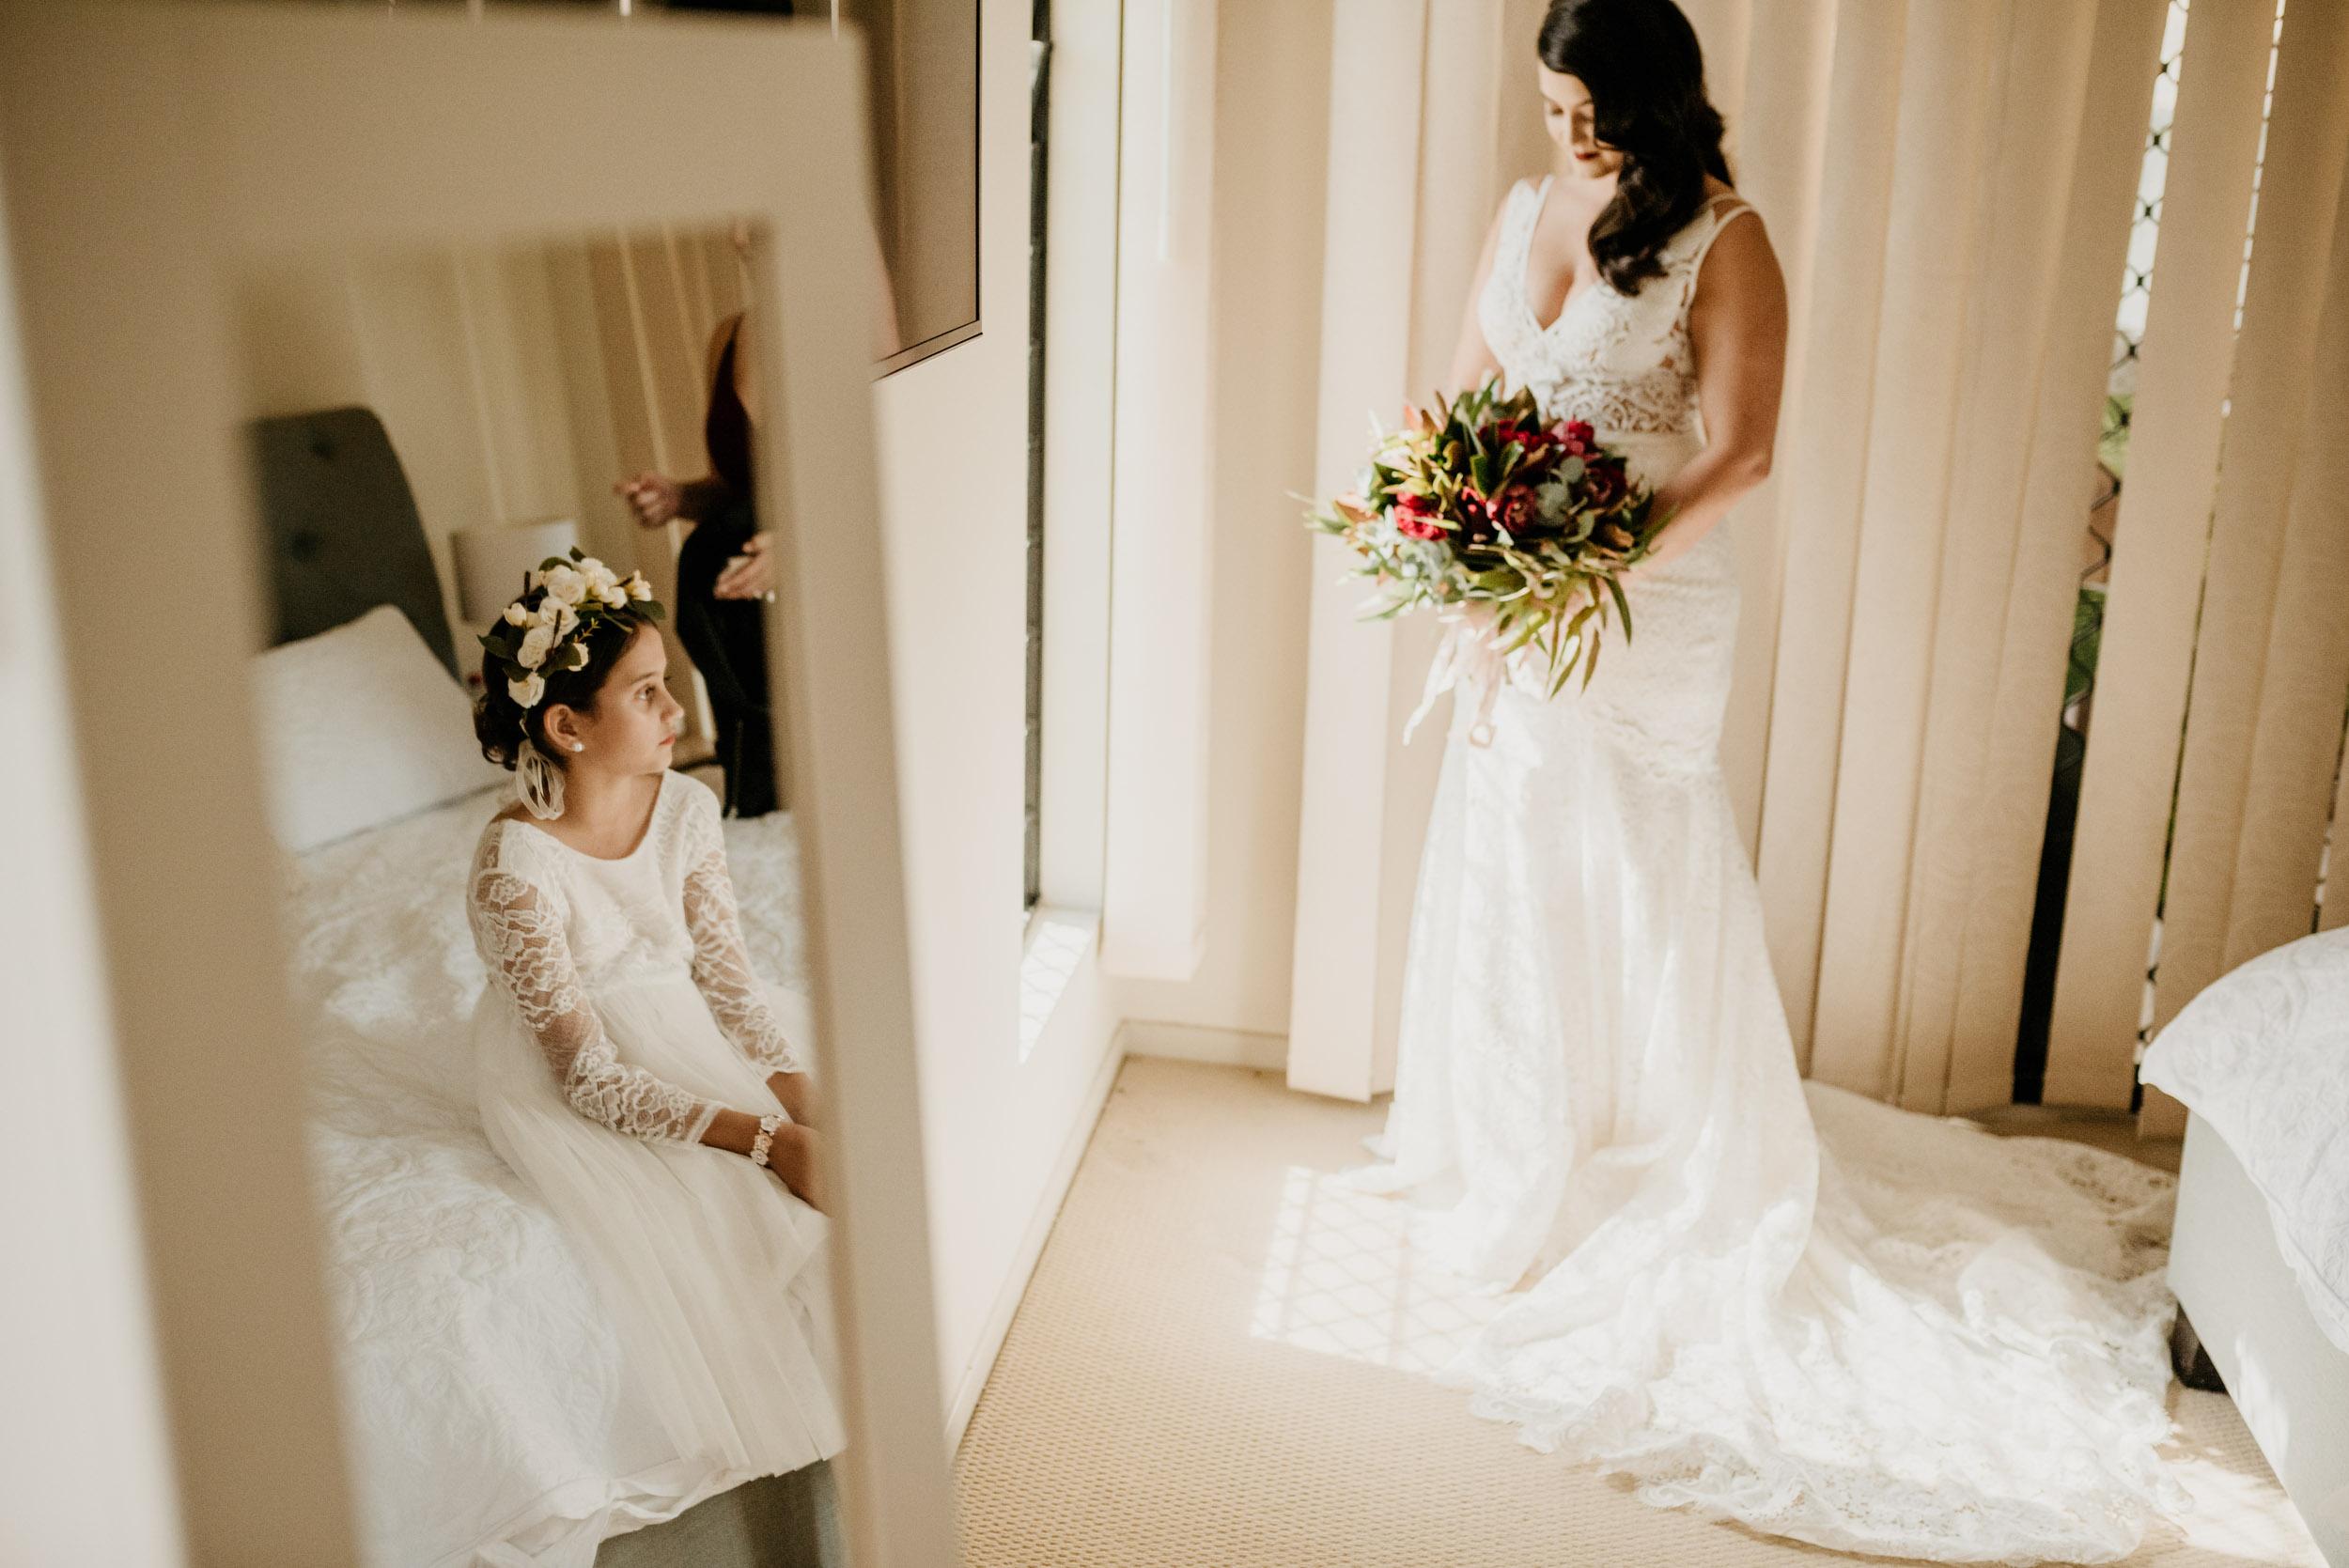 The Raw Photographer - Cairns and Port Douglas Wedding Photographer - Best of 2018-16.jpg